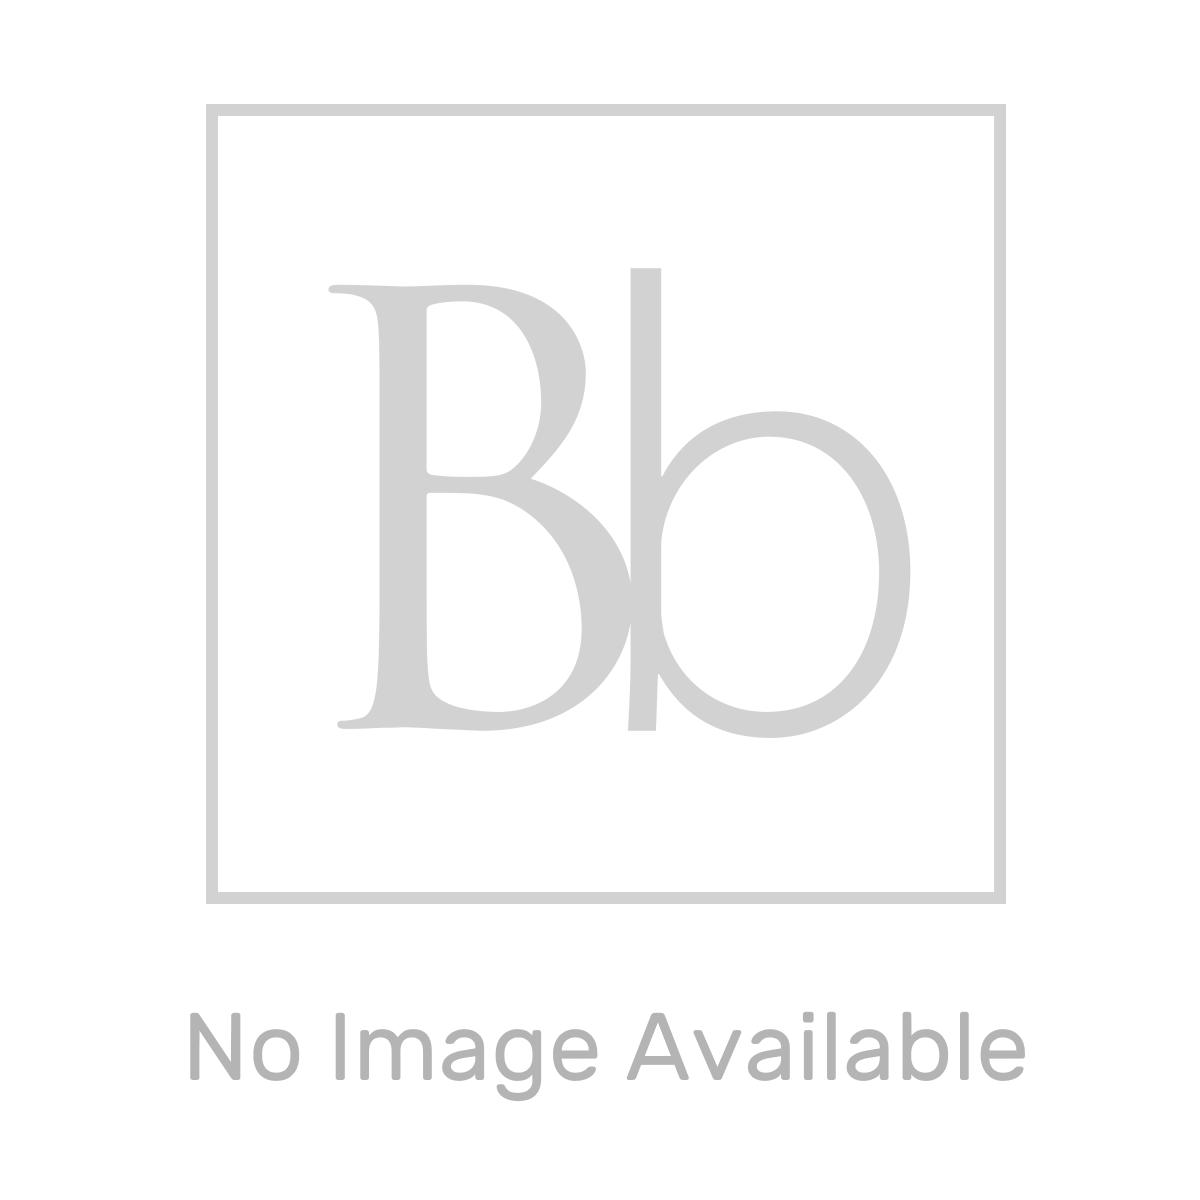 Merlyn Black Crittall Shower Screen Enclosure